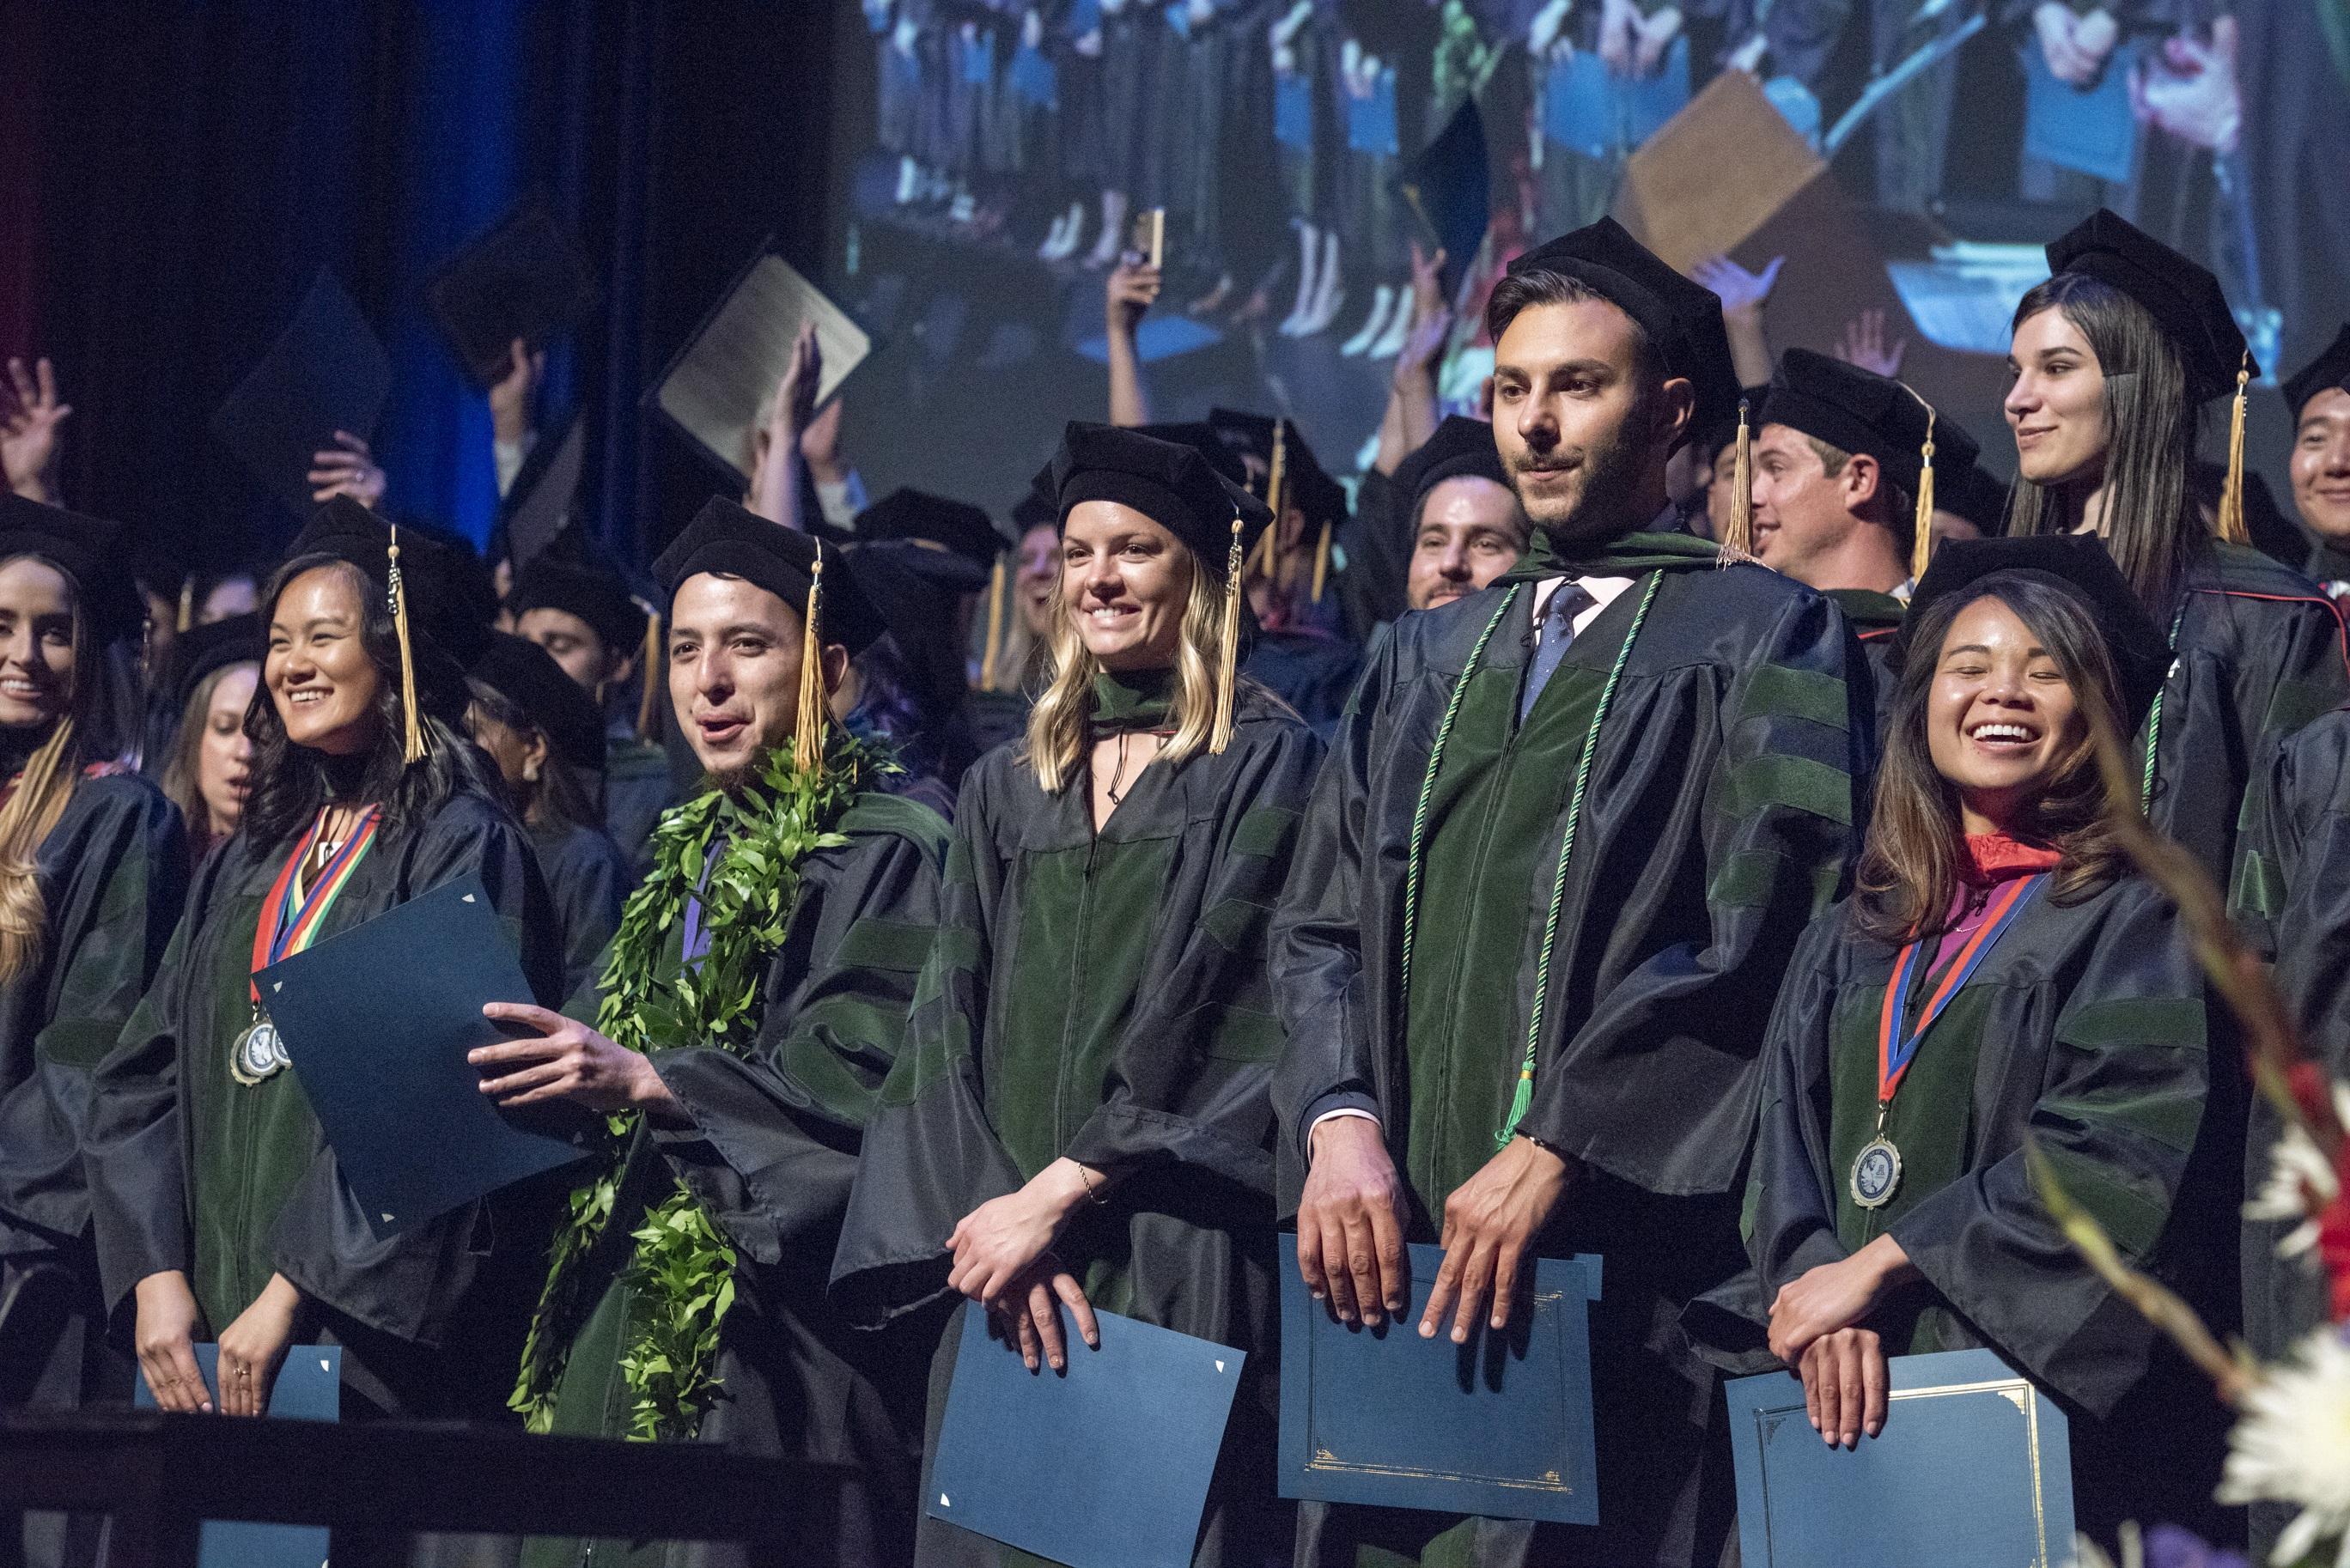 University Of Phoenix Graduation 2020 Dates.Class Of 2020 Convocation College Of Medicine Tucson